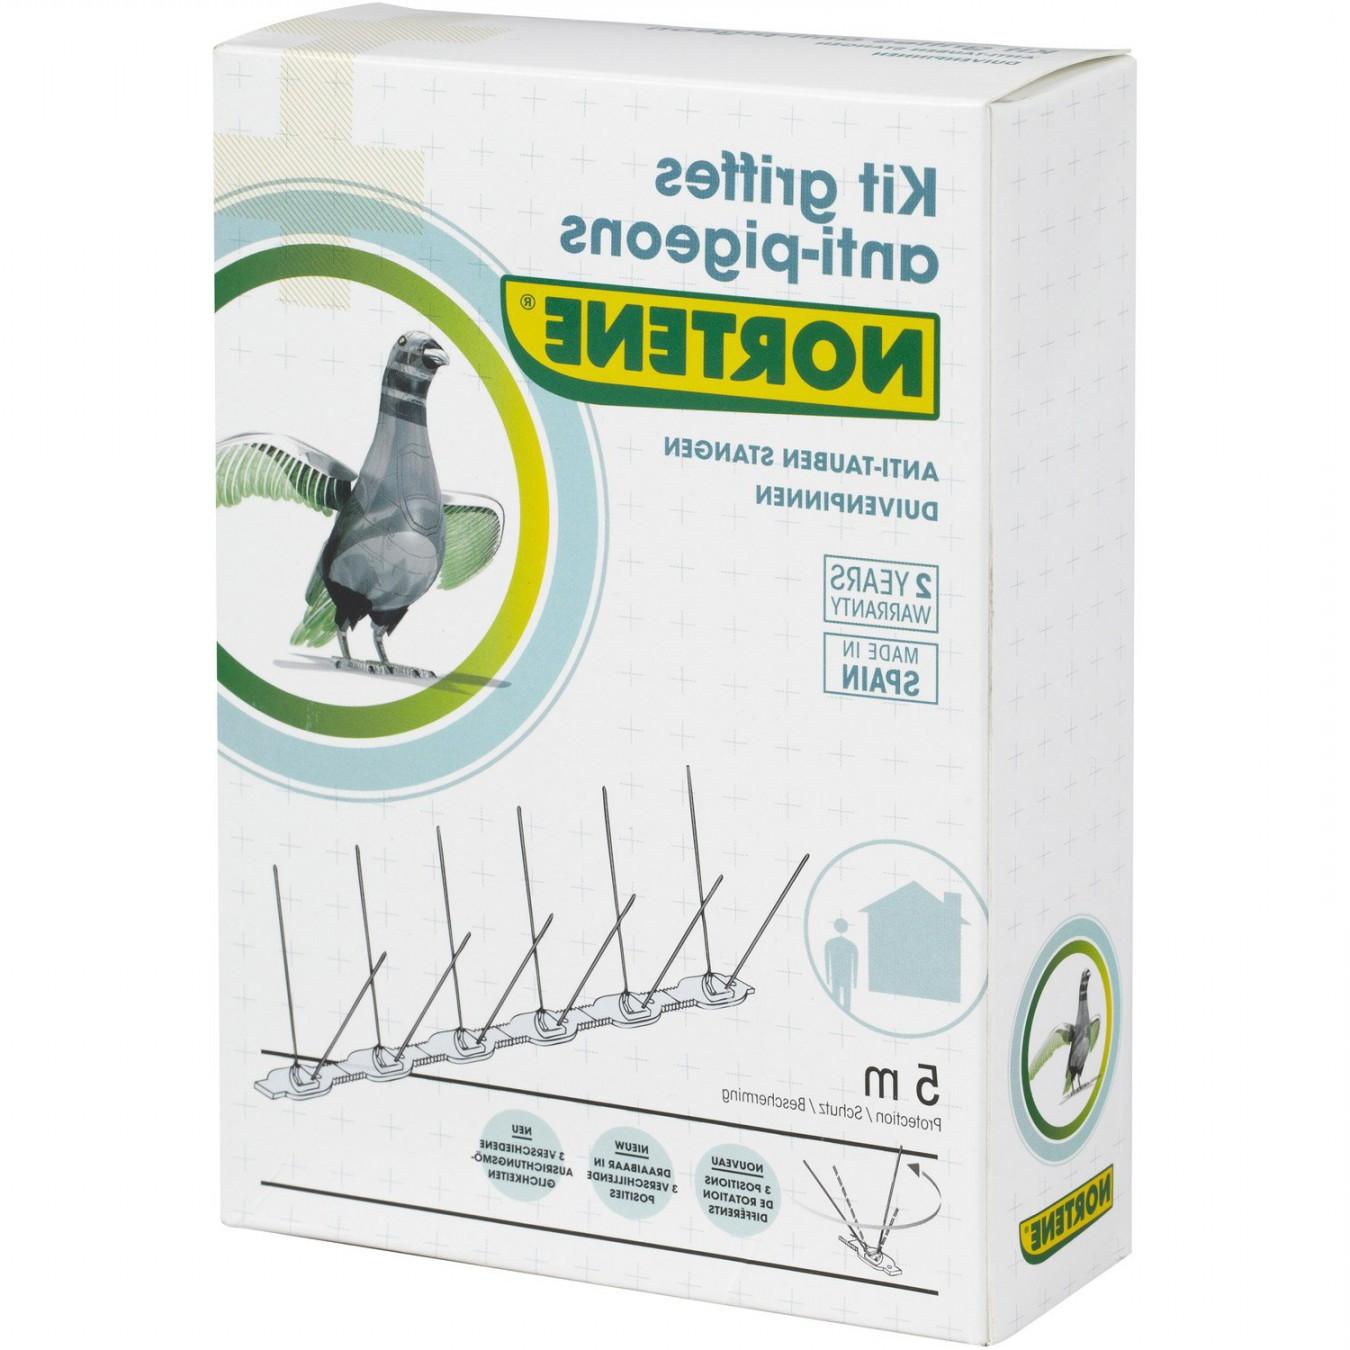 piege anti pigeon leroy merlin. Black Bedroom Furniture Sets. Home Design Ideas